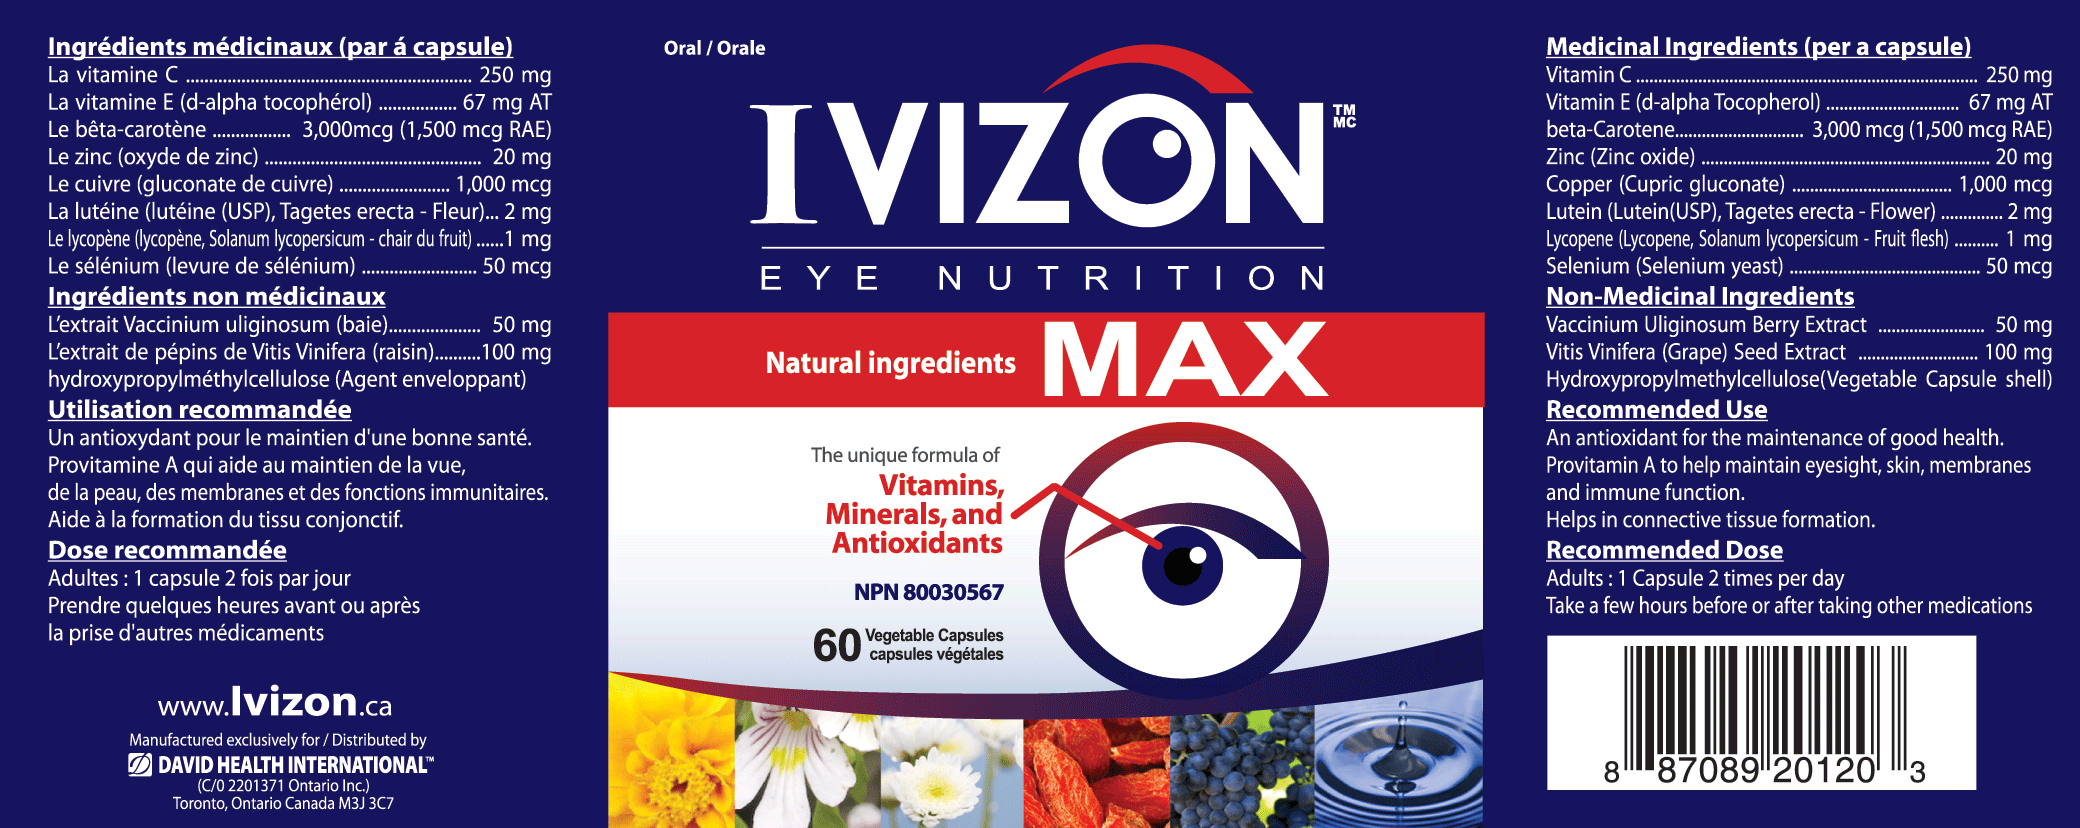 Ivizon Max 500 mg 60 Vcaps - 6 PACK